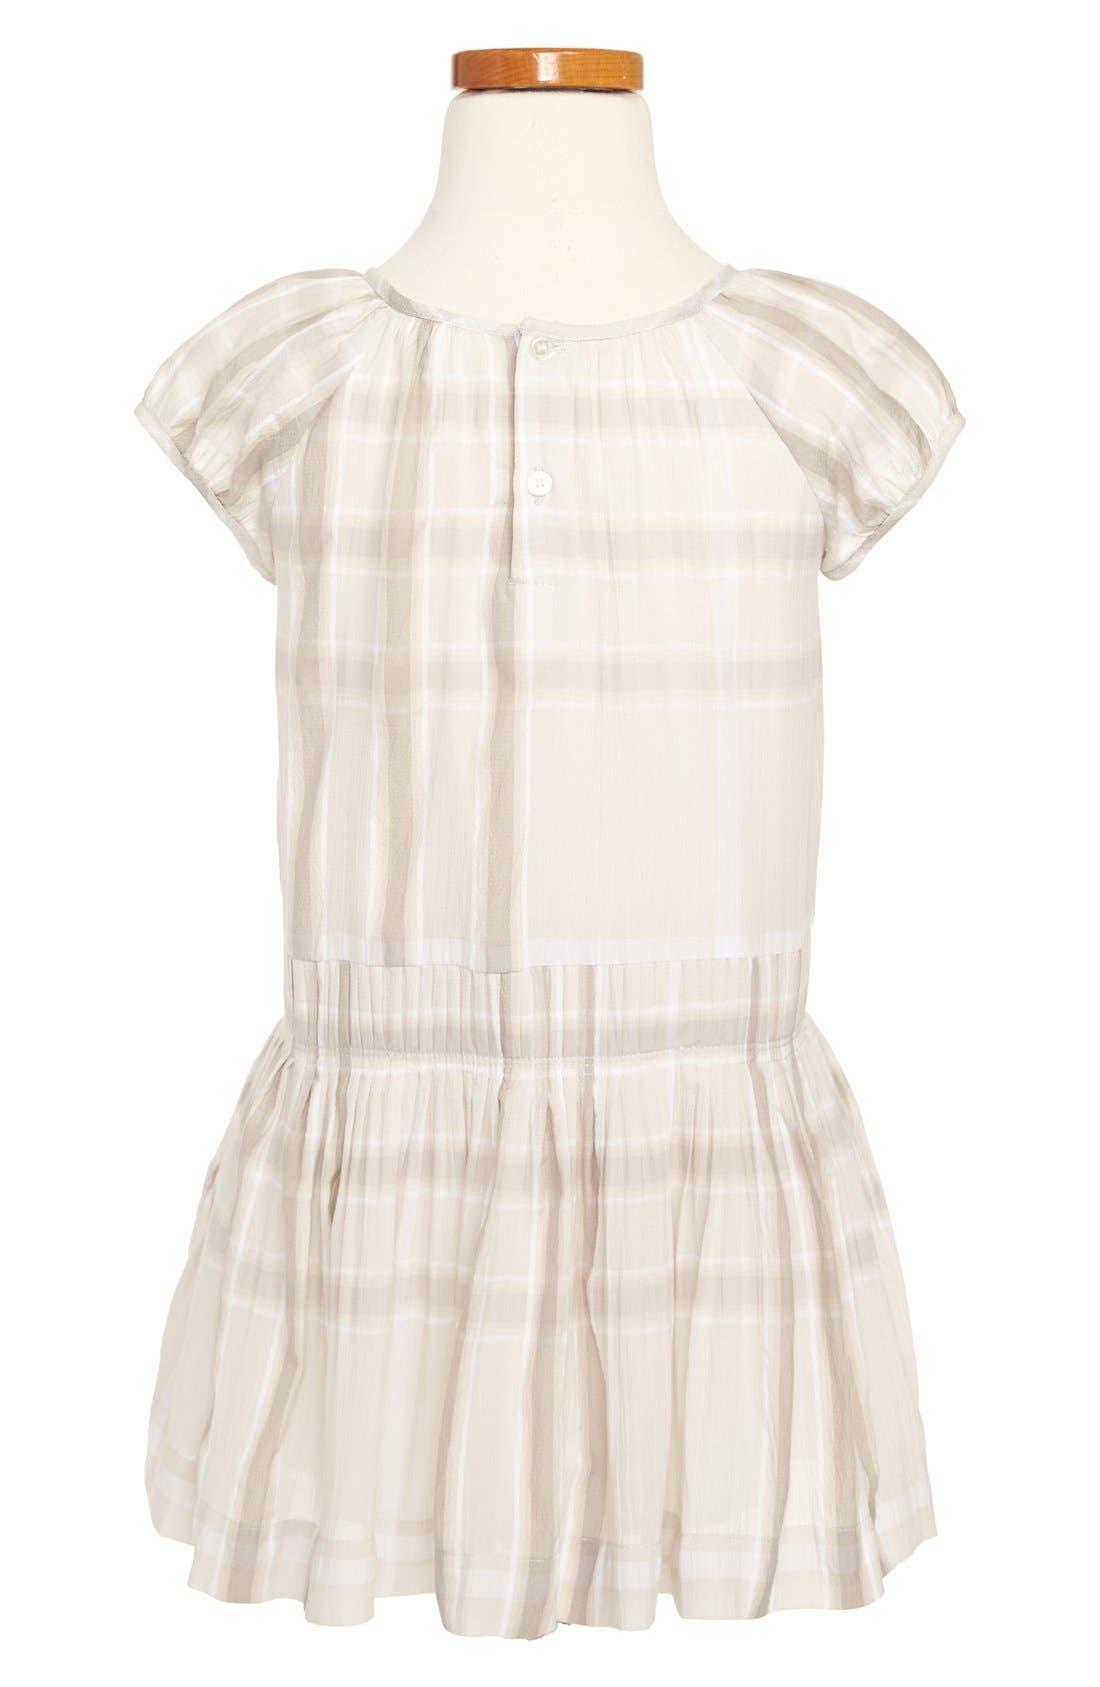 Alternate Image 2  - Burberry 'Edemme' Dress (Little Girls & Big Girls)